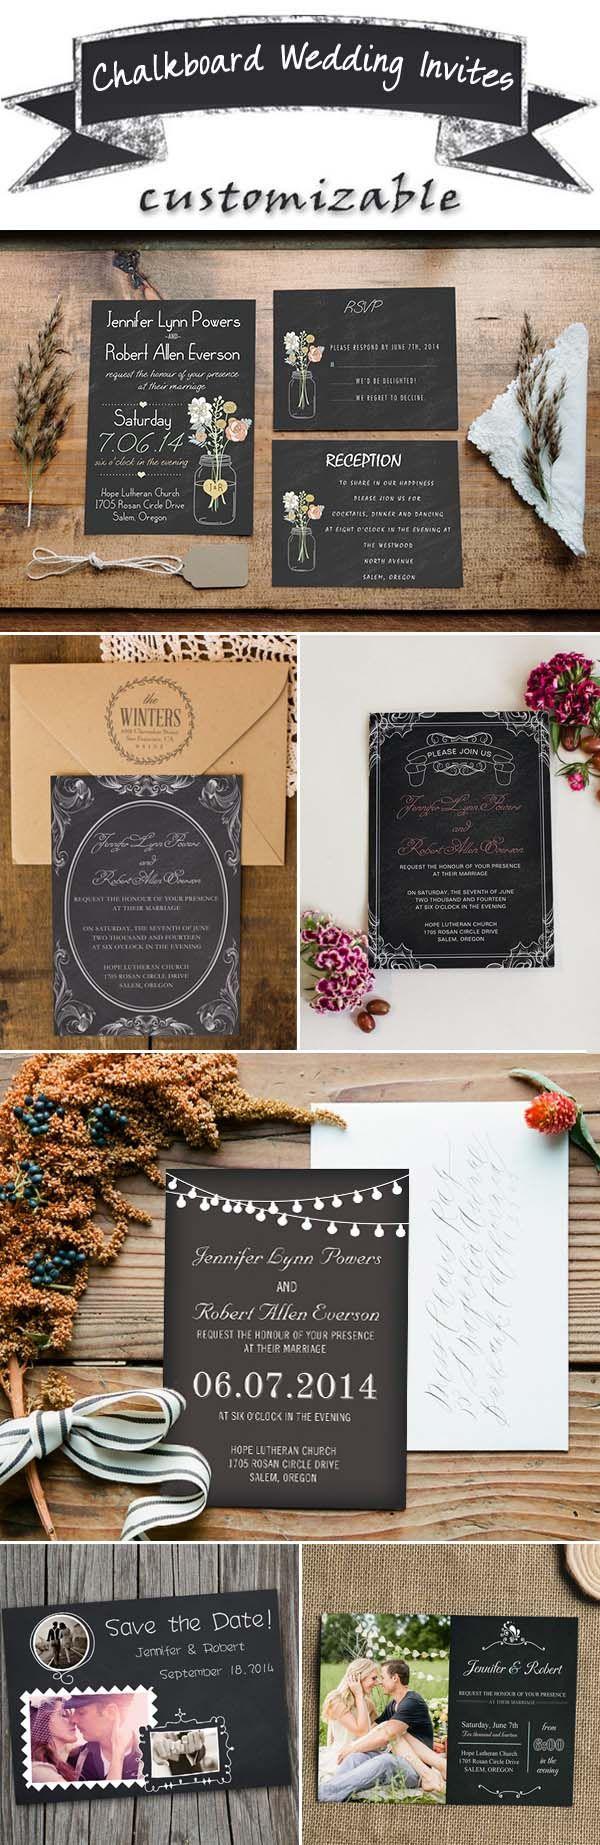 stylish chalkboard wedding invitations